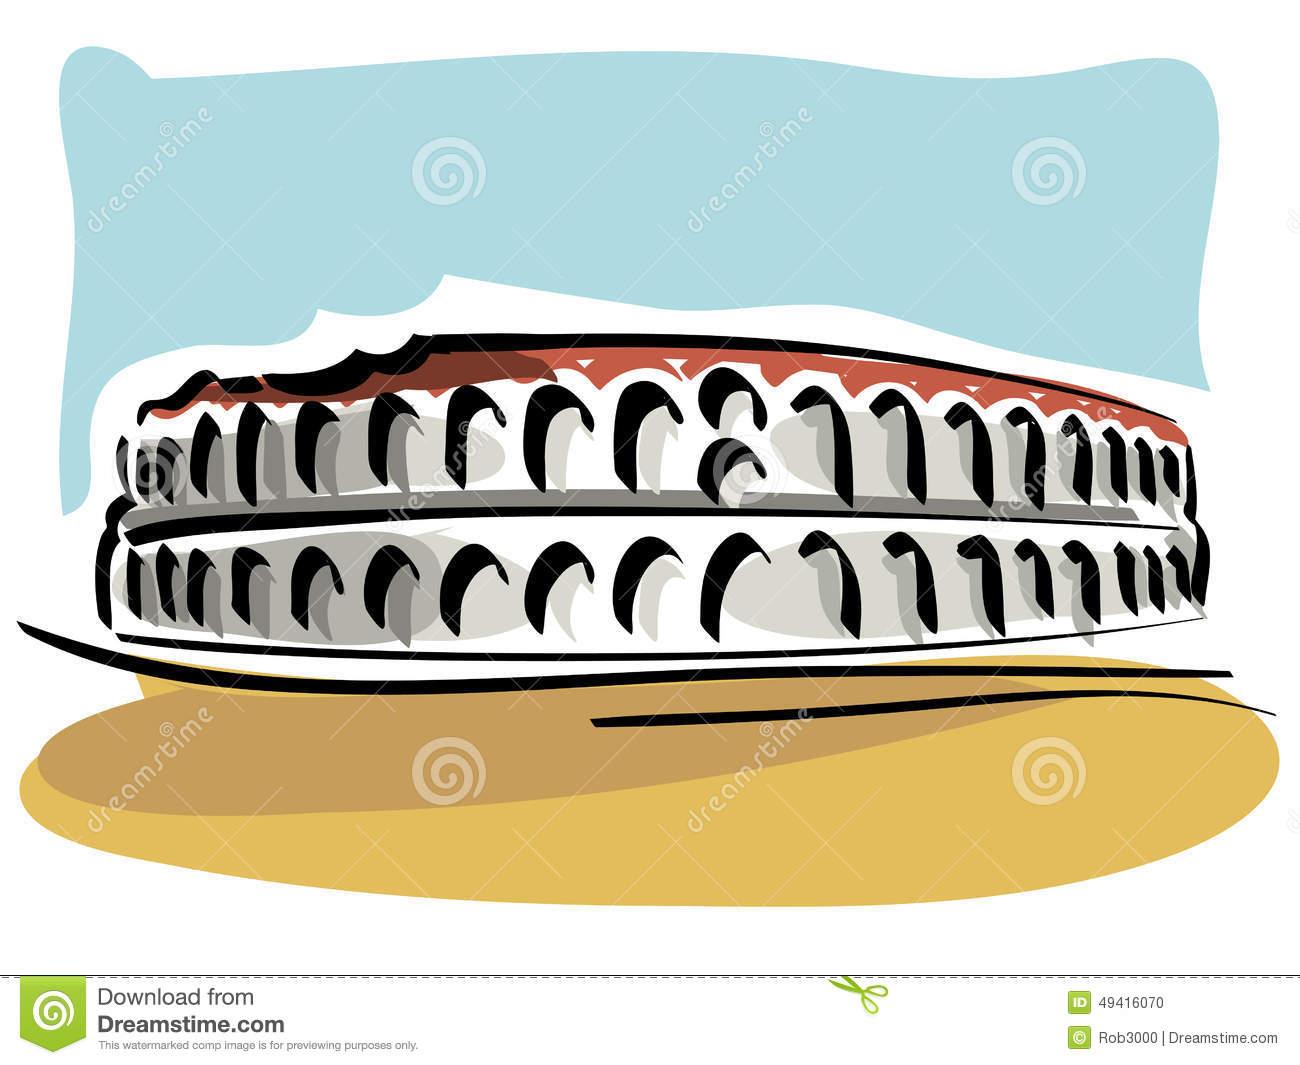 Arena clipart Clipart Di Download Verona Clip